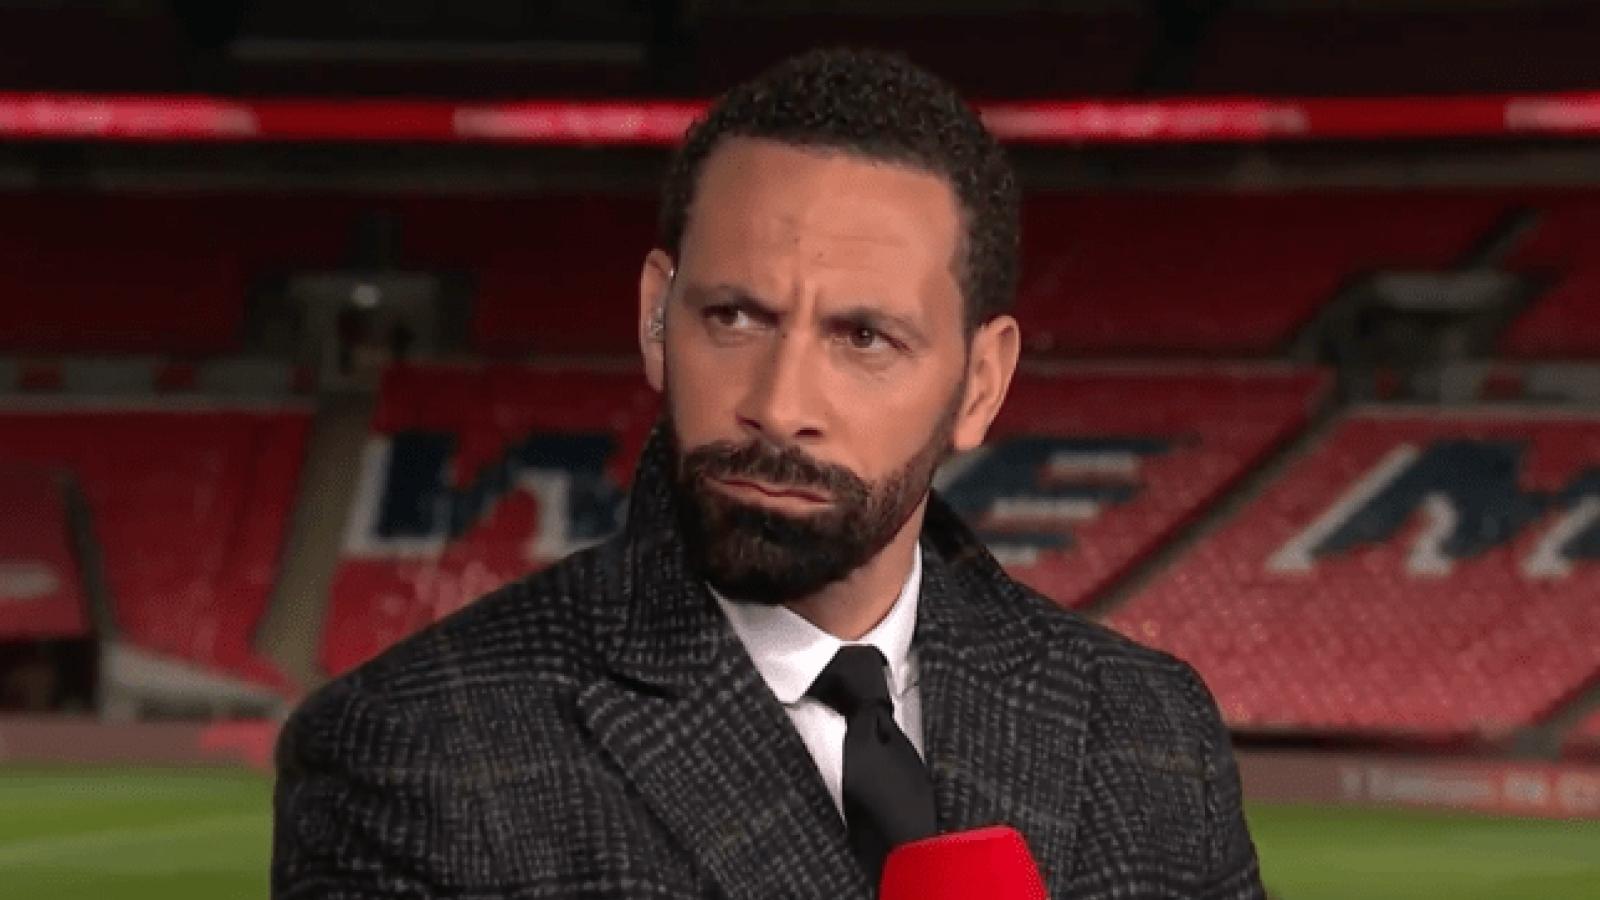 Huyền thoại MU thấy xấu hổ khi Quỷ đỏ tham gia European Super League